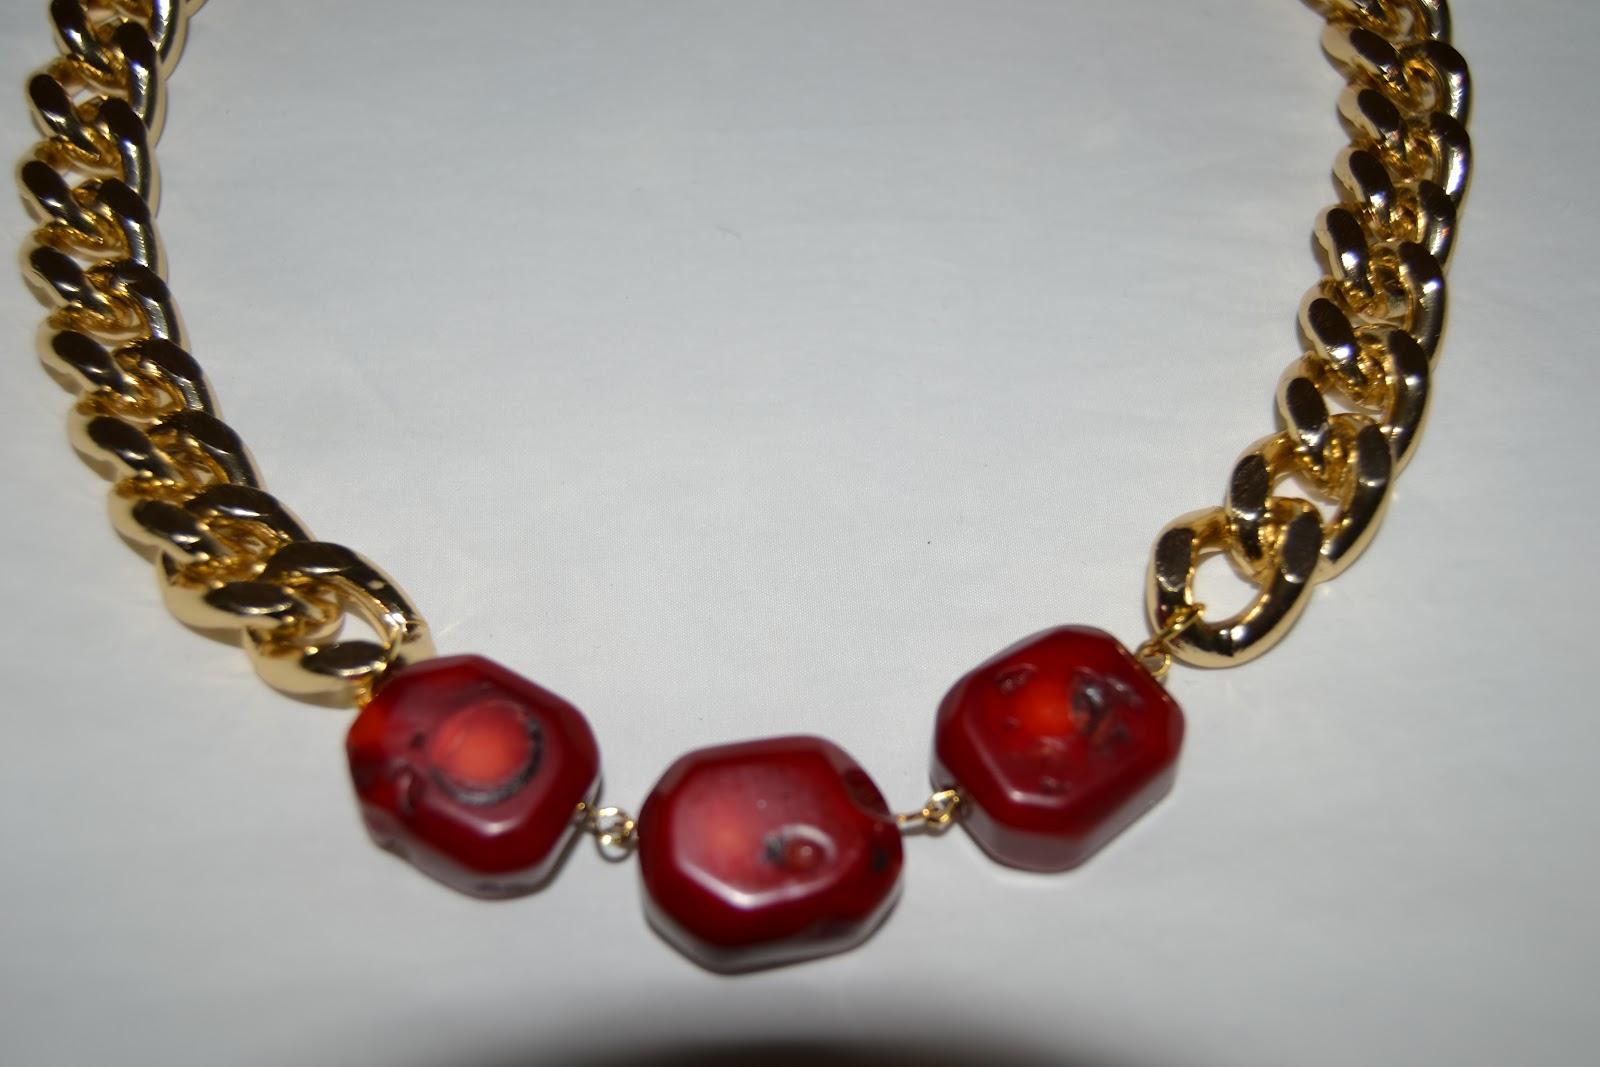 Mg atelier collares piedra natural - Piedras para collares ...